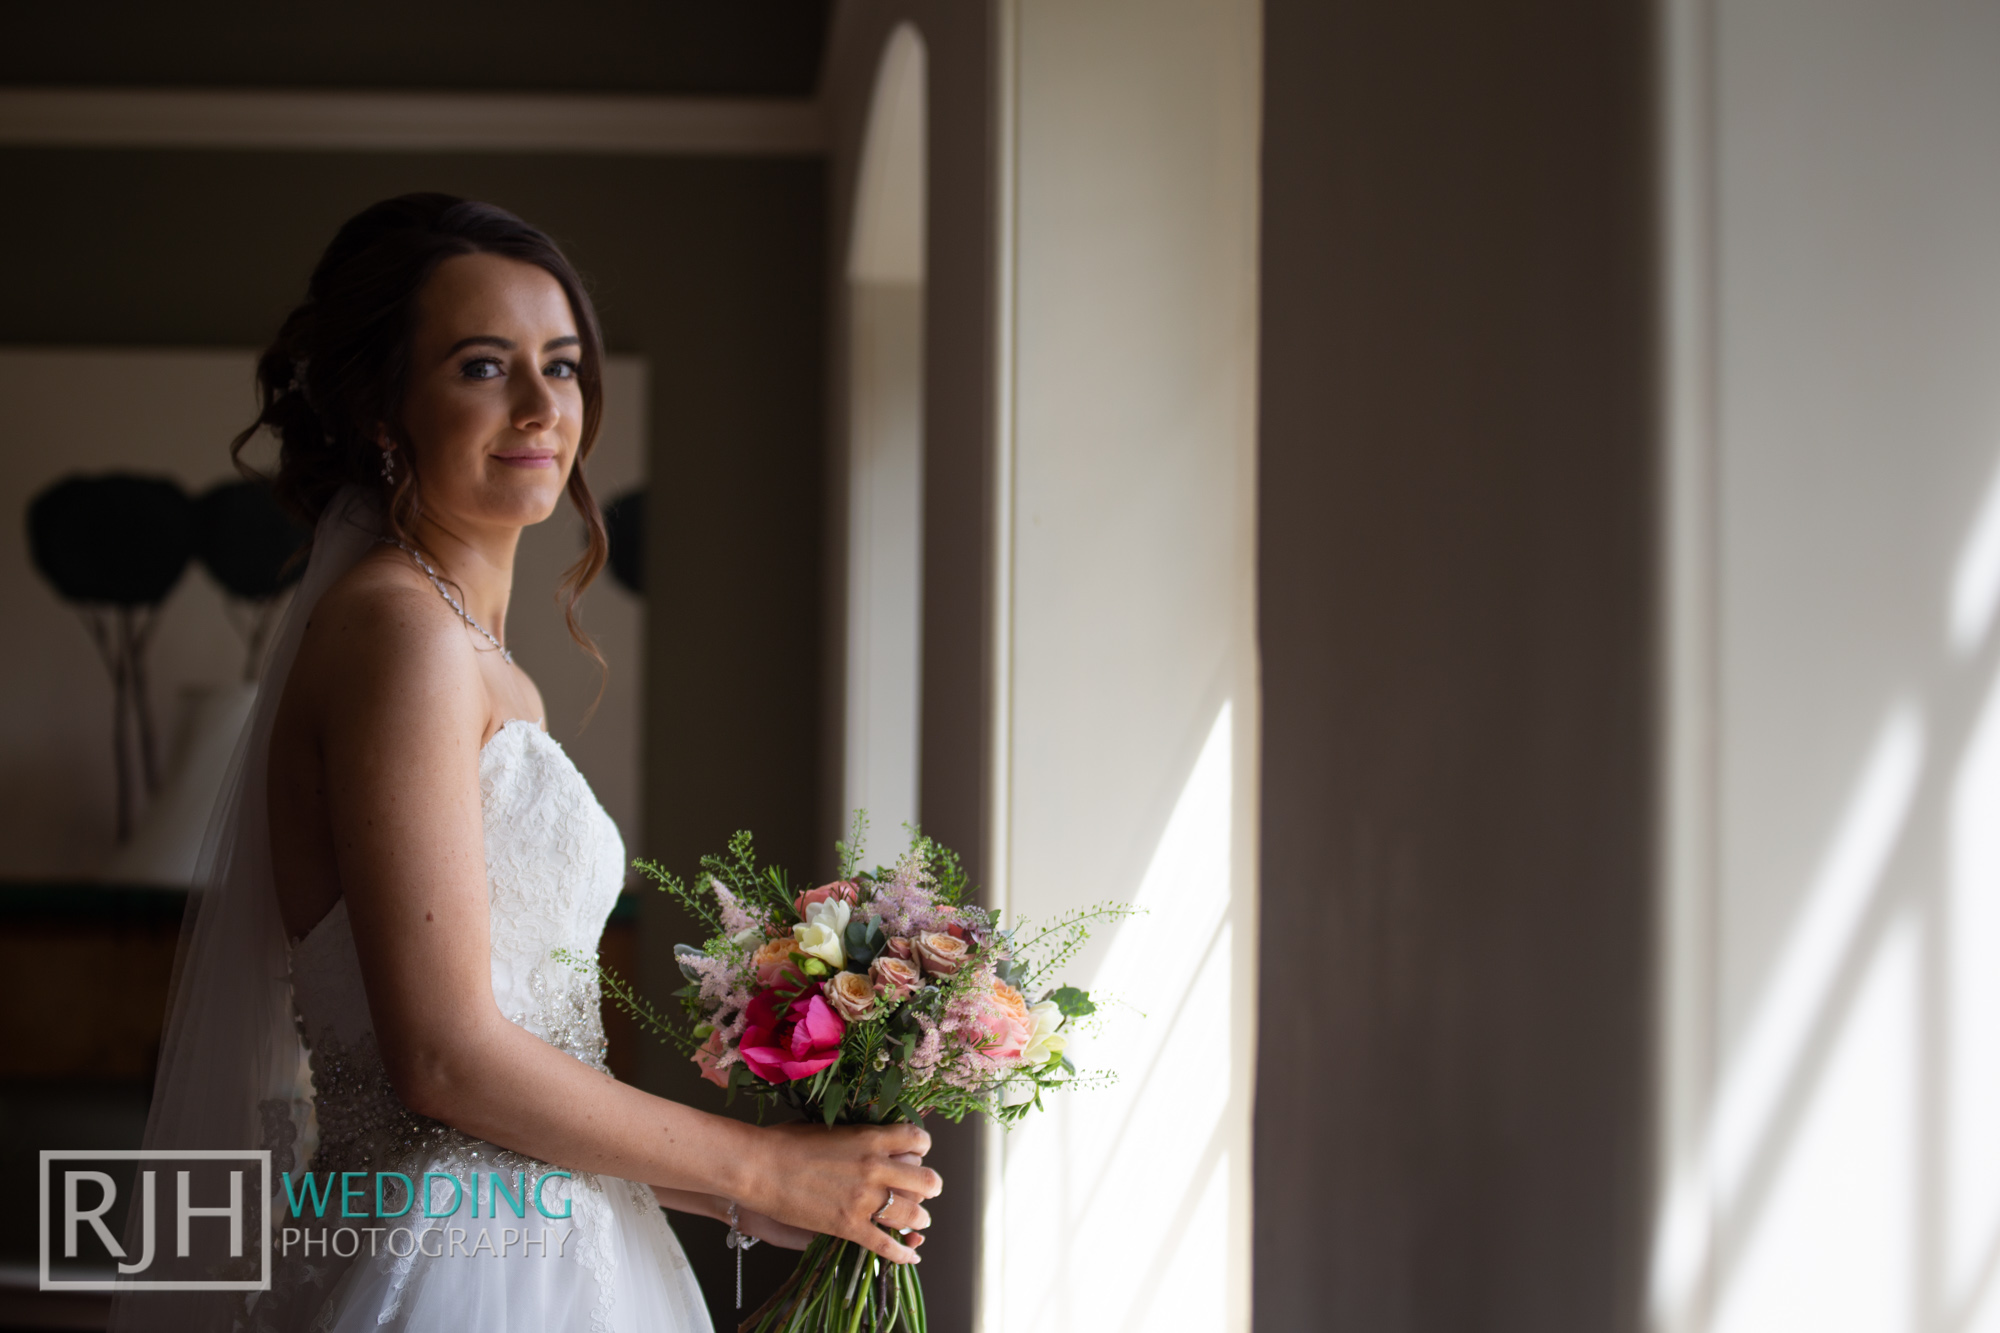 Whirlowbrook Hall Wedding Photography_Jack & Lydia_022_IMG_4198.jpg